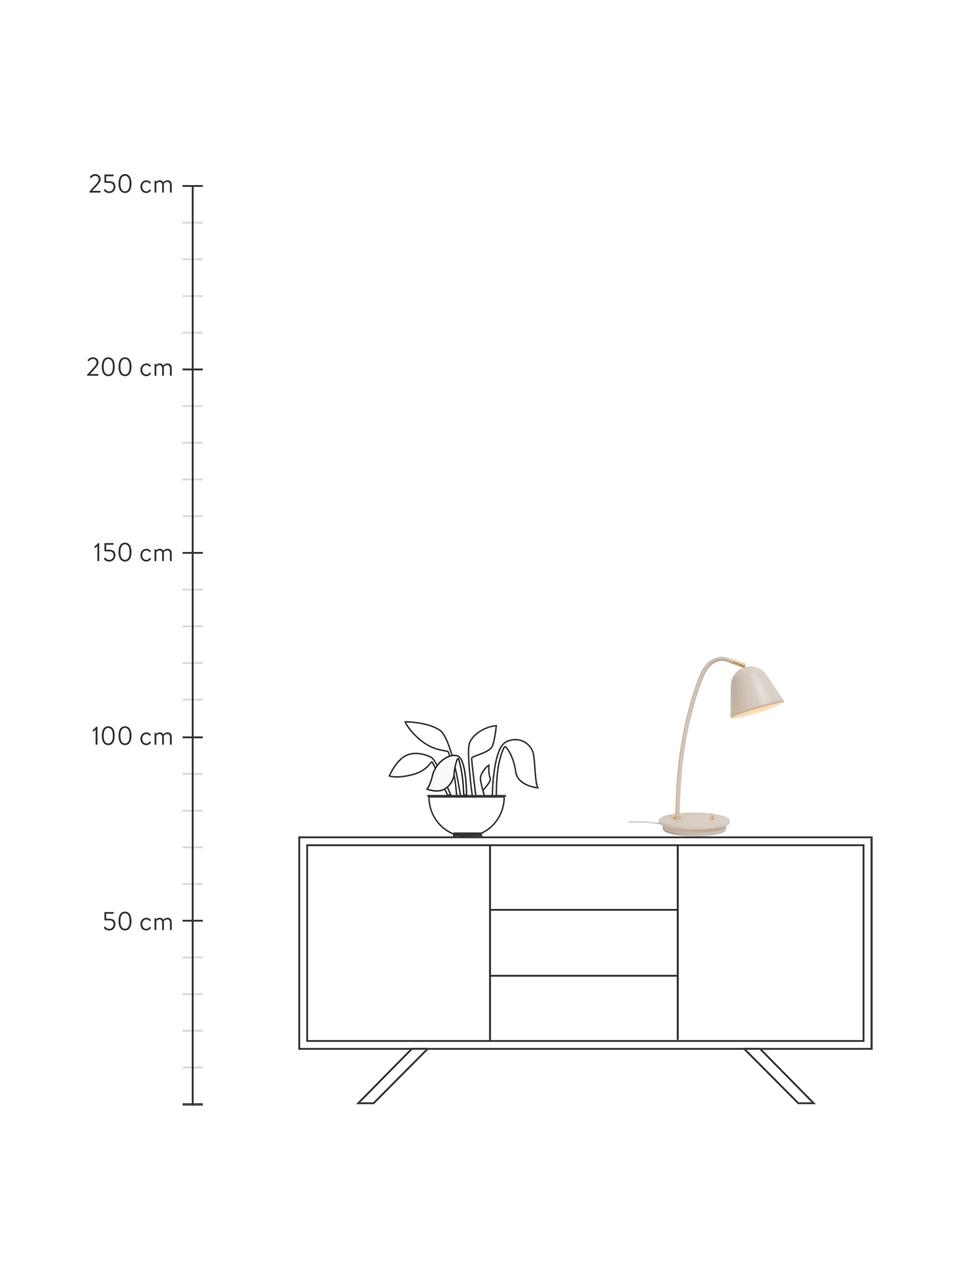 Schreibtischlampe Fleur in Beige, Lampenschirm: Metall, beschichtet, Lampenfuß: Metall, beschichtet, Dekor: Metall, Beige, 20 x 49 cm